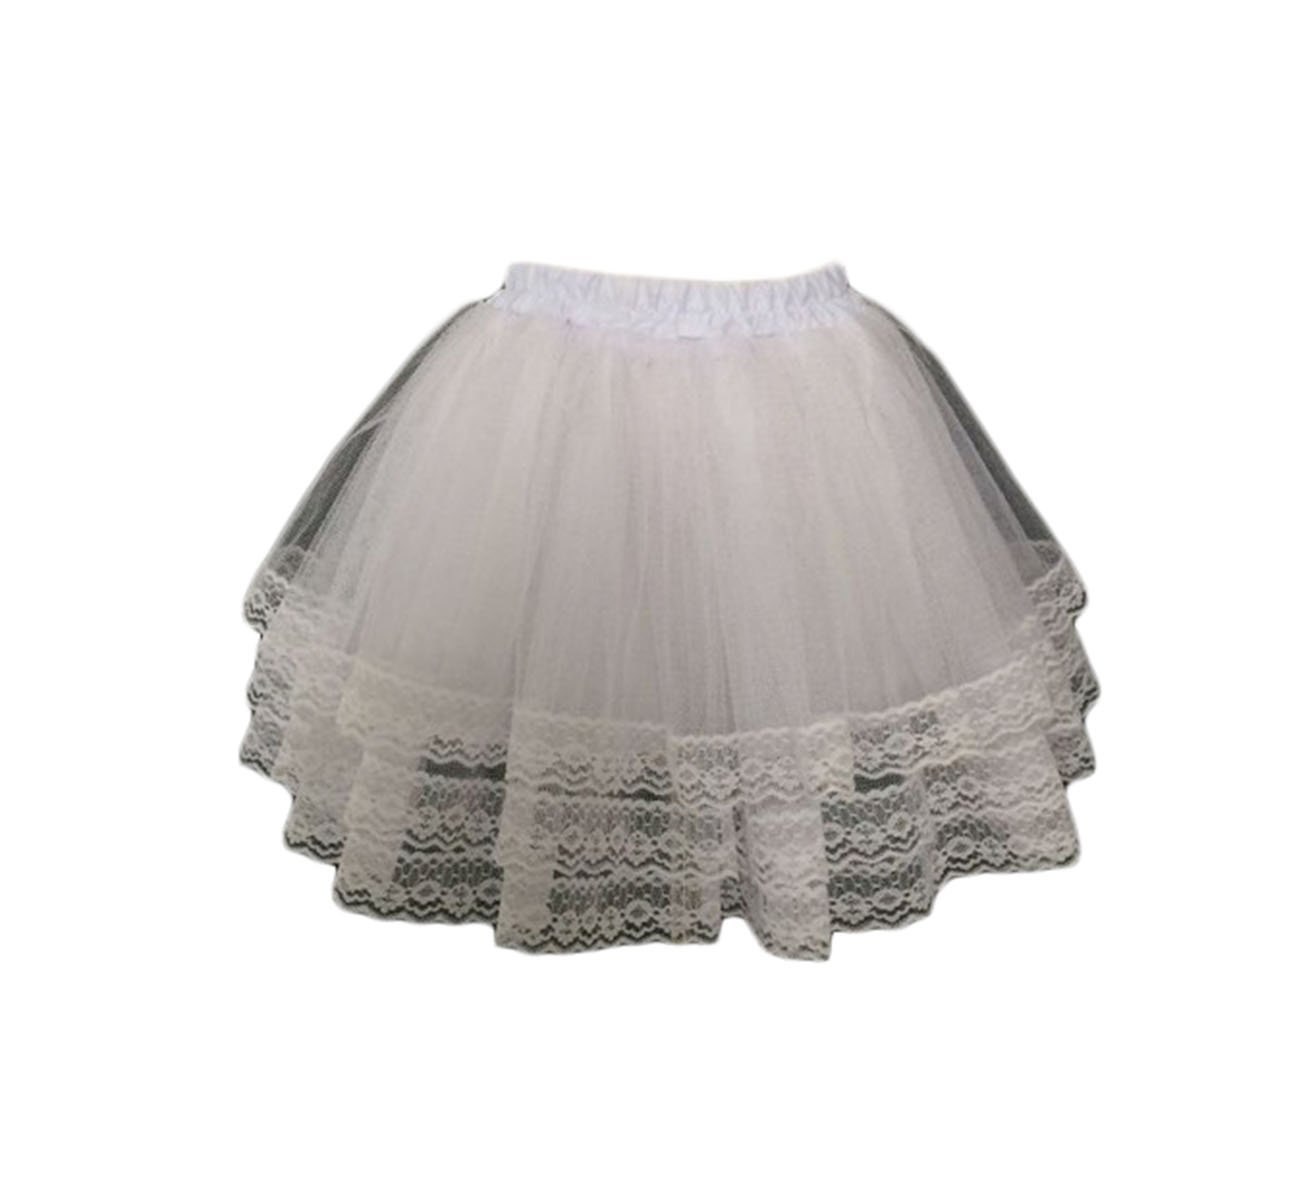 Dannifore Girl's 3 Layers Lace Tulle Petticoat Hoopless Short Children Underskirt Slips White,Style2